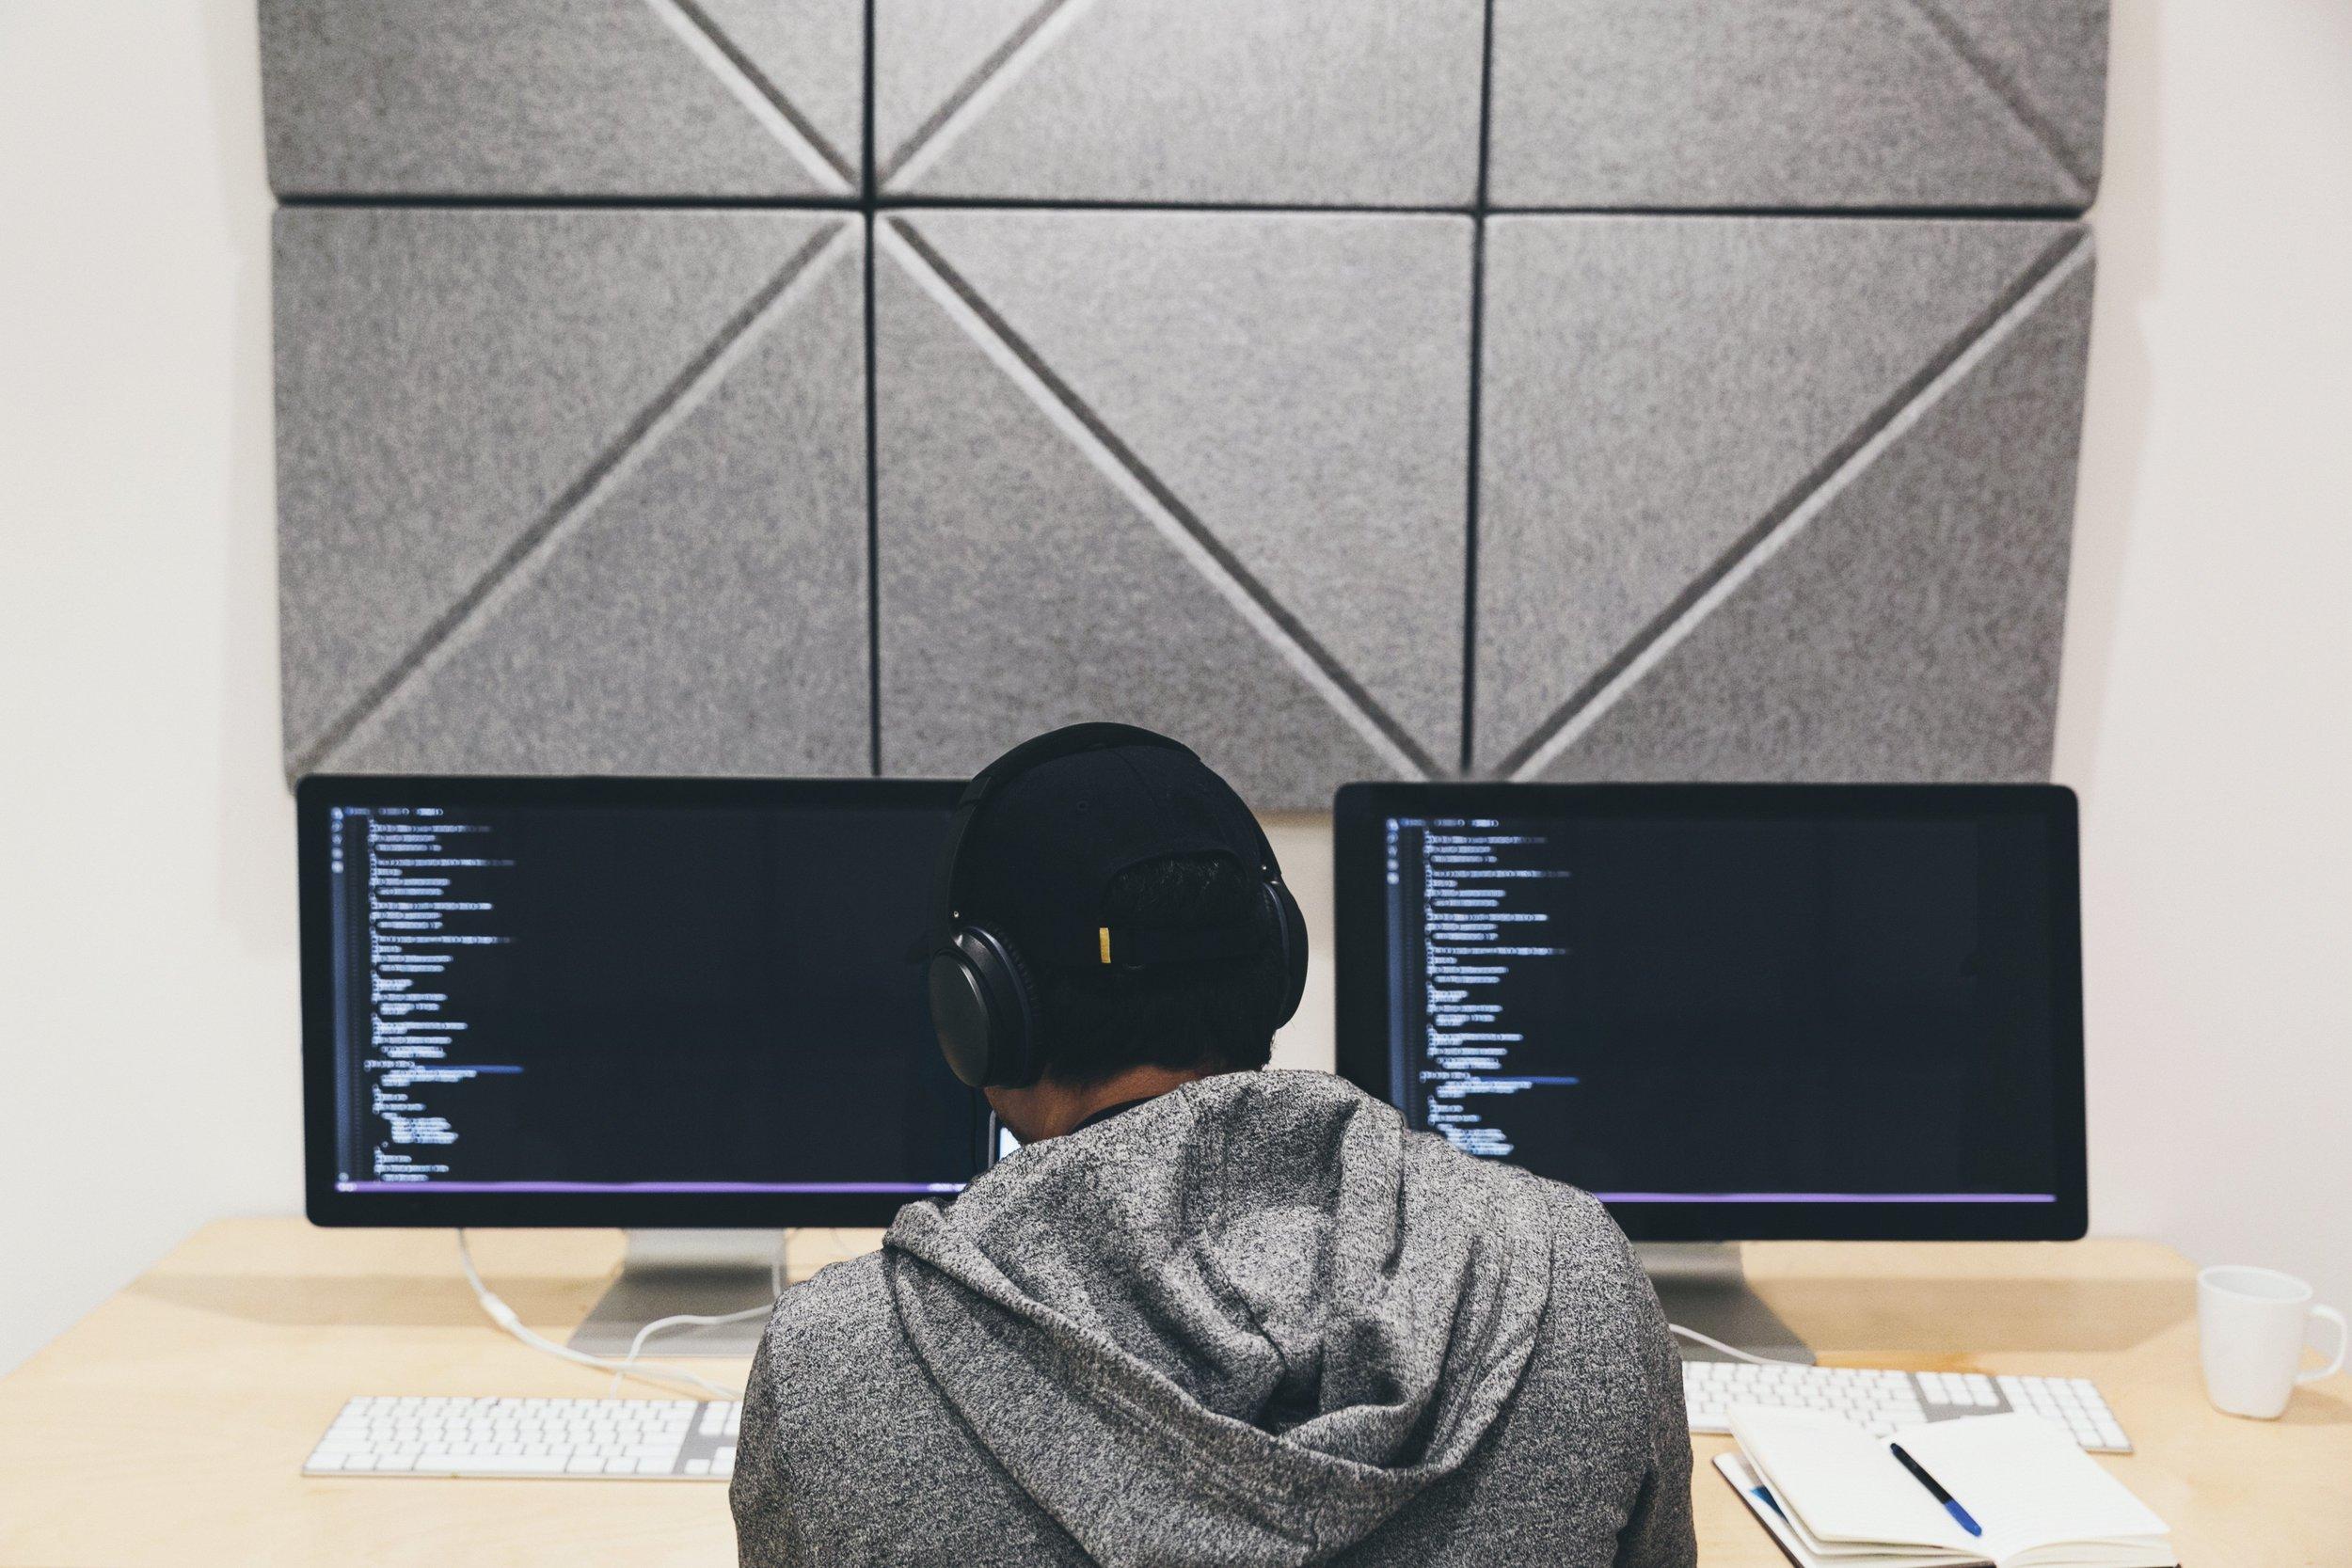 programmer-focused-on-code.jpg